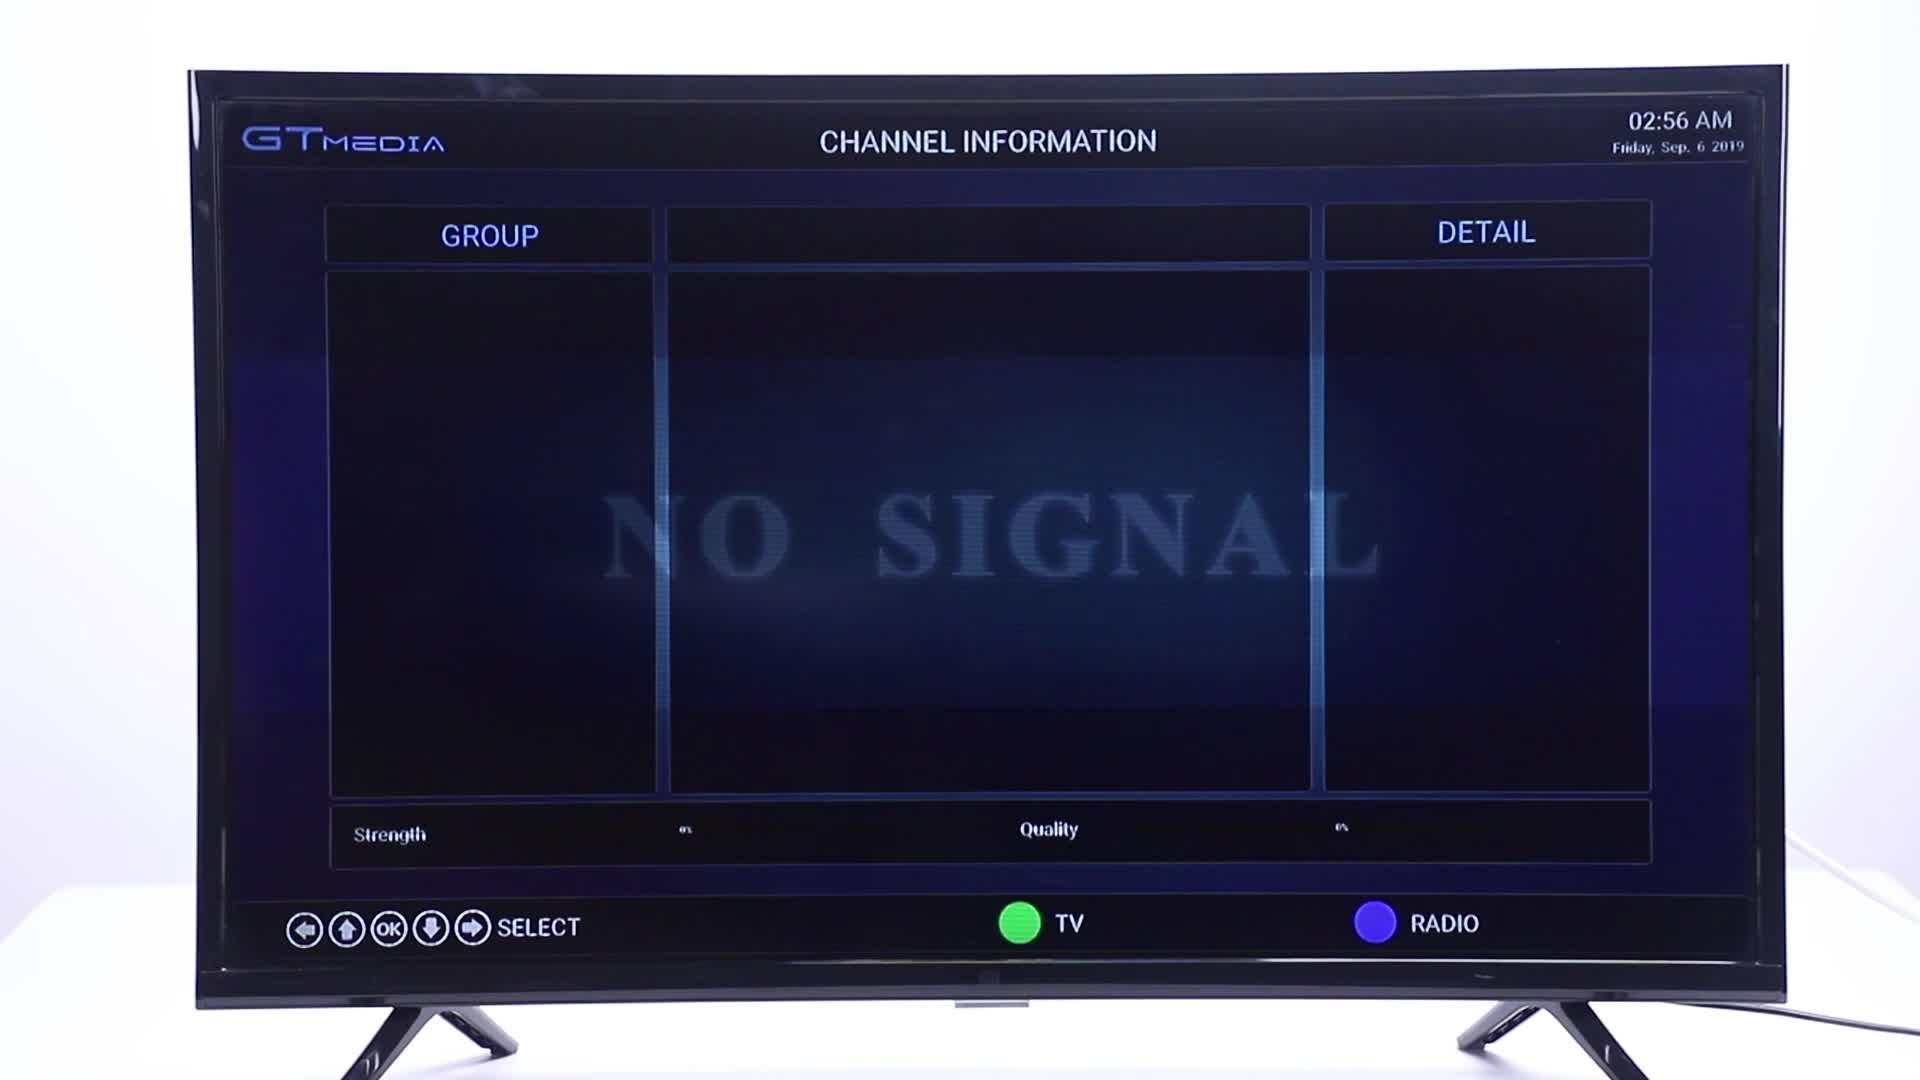 GT MEDIA GTC Receptor Satelite Decodificador TDT Android 6.0 TV Box 4K DVB-S/S2 DVB-T/T2/Cable 3D H.265 HEVC MPEG-2/4 WiFi 2.4Ghz BT 4.0 Smart TV Box ...